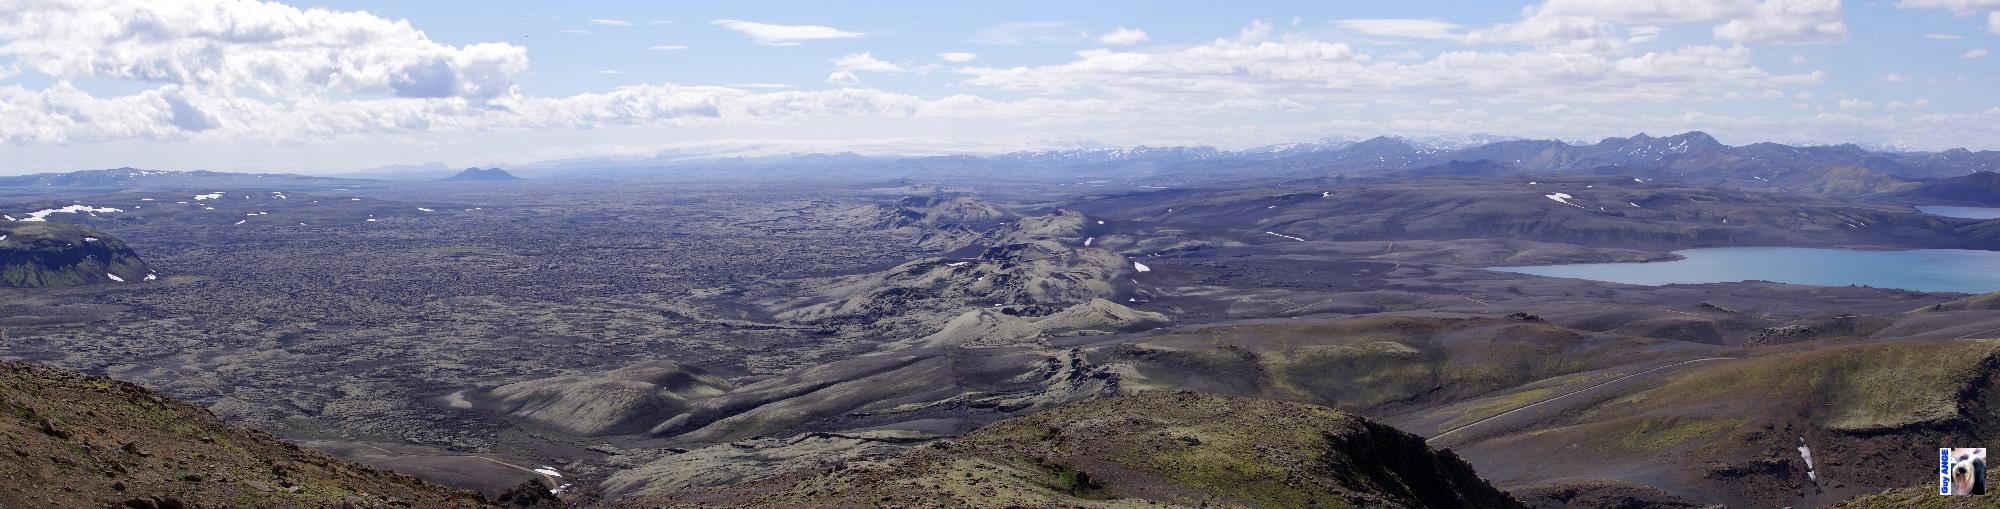 Fissure éruptive du Lakagirar en direction du Myrdalsjokull.